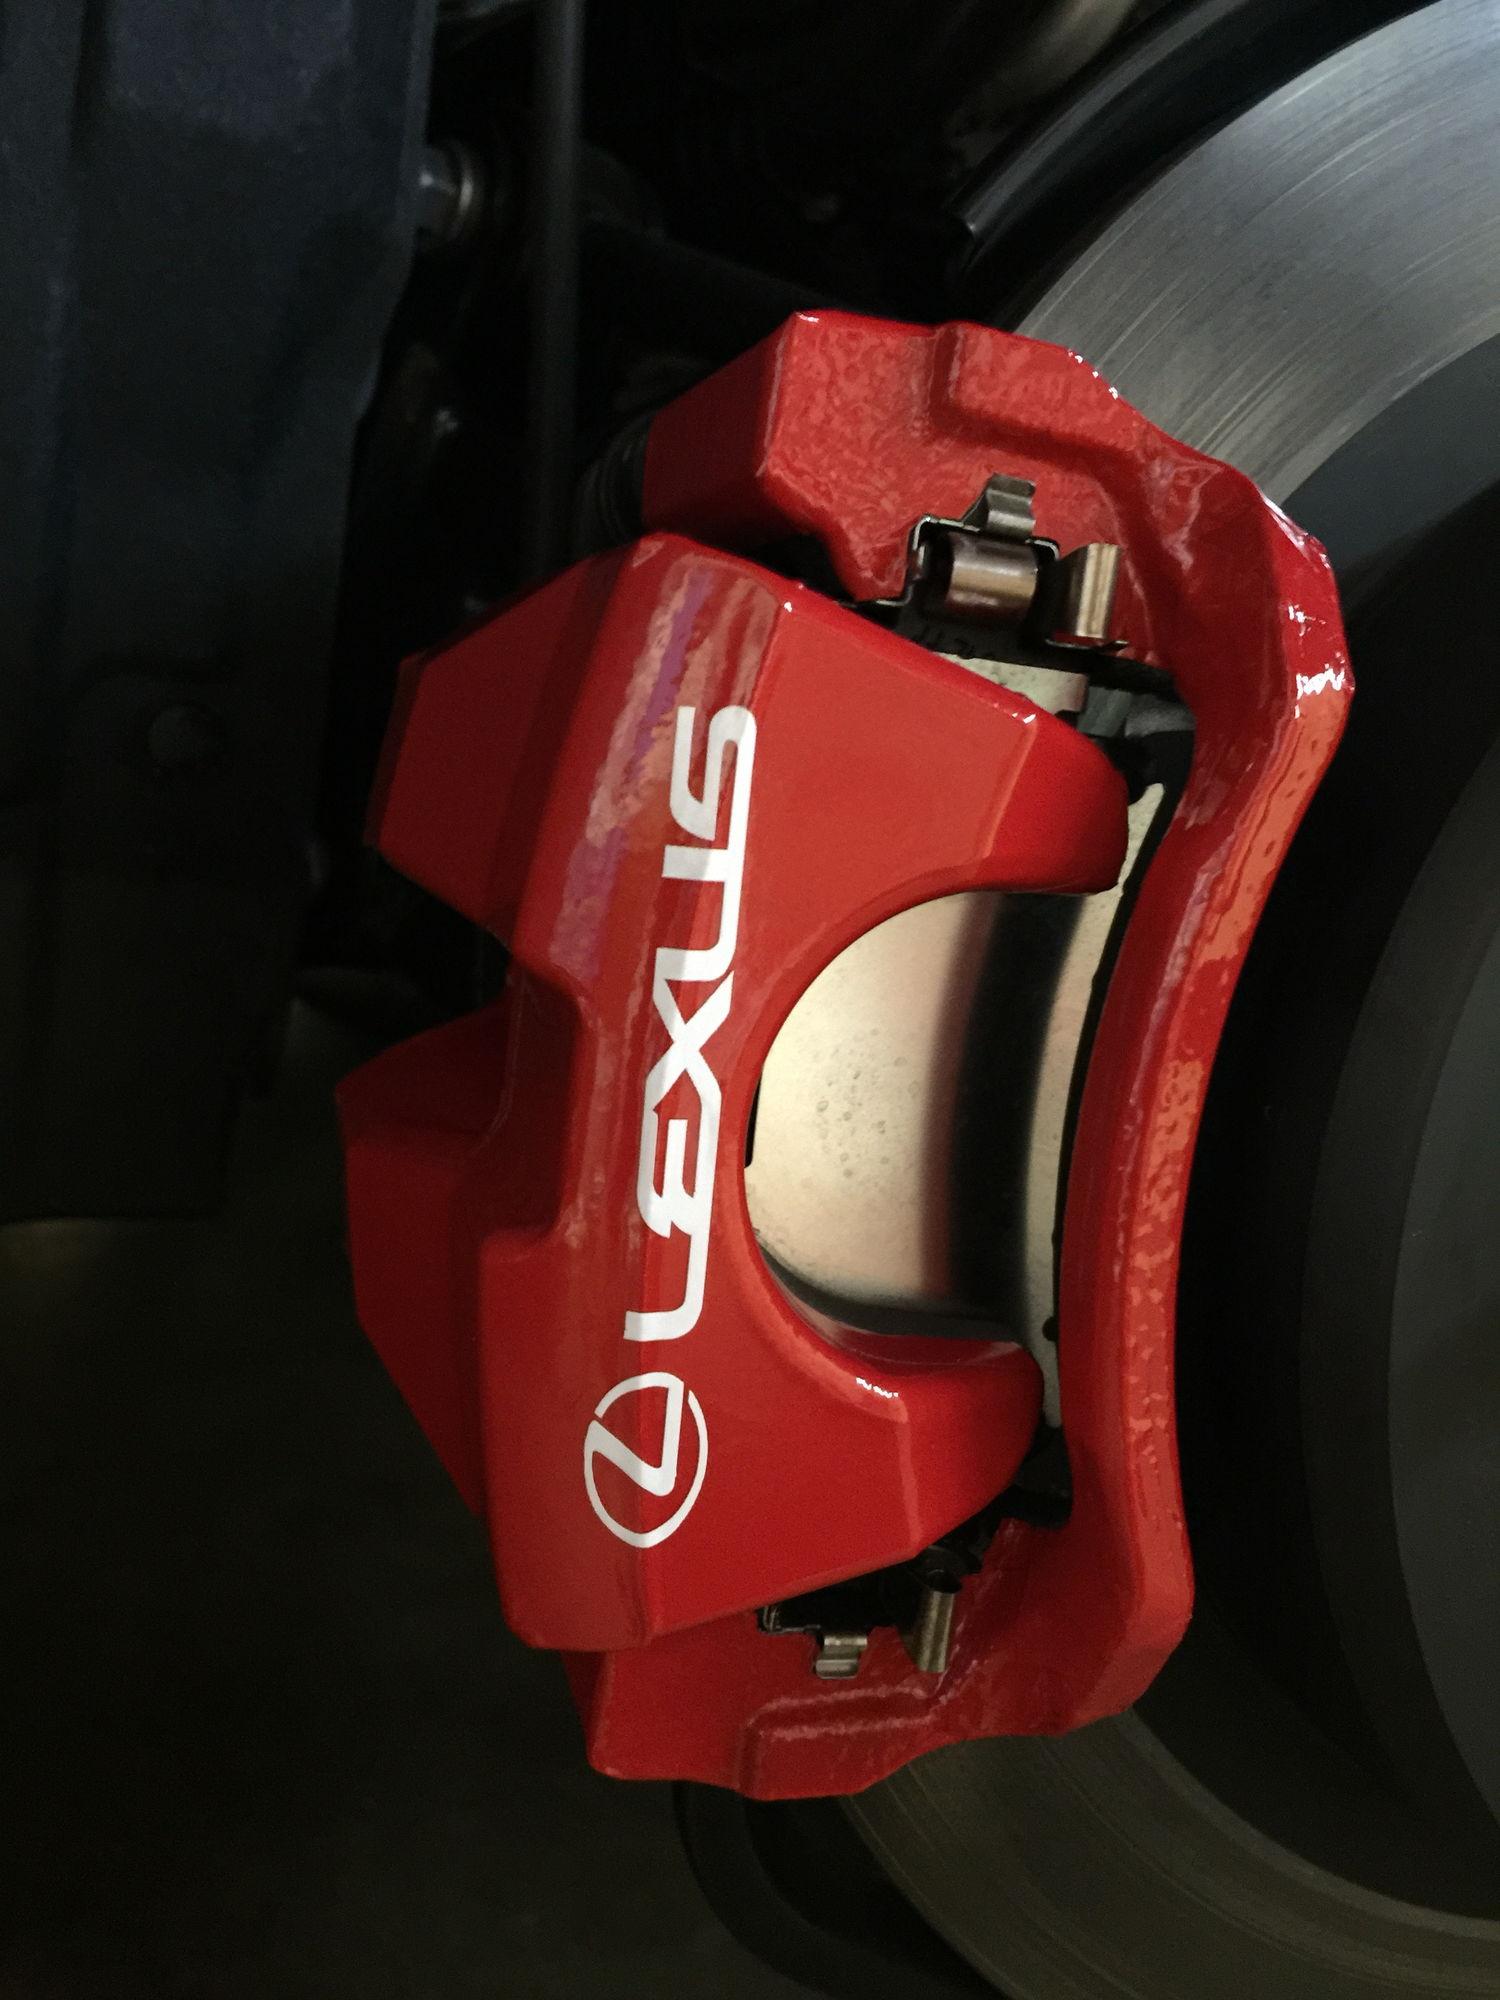 3m Reflective Red Brake Caliper Vinyl Wrap Club Lexus Forums